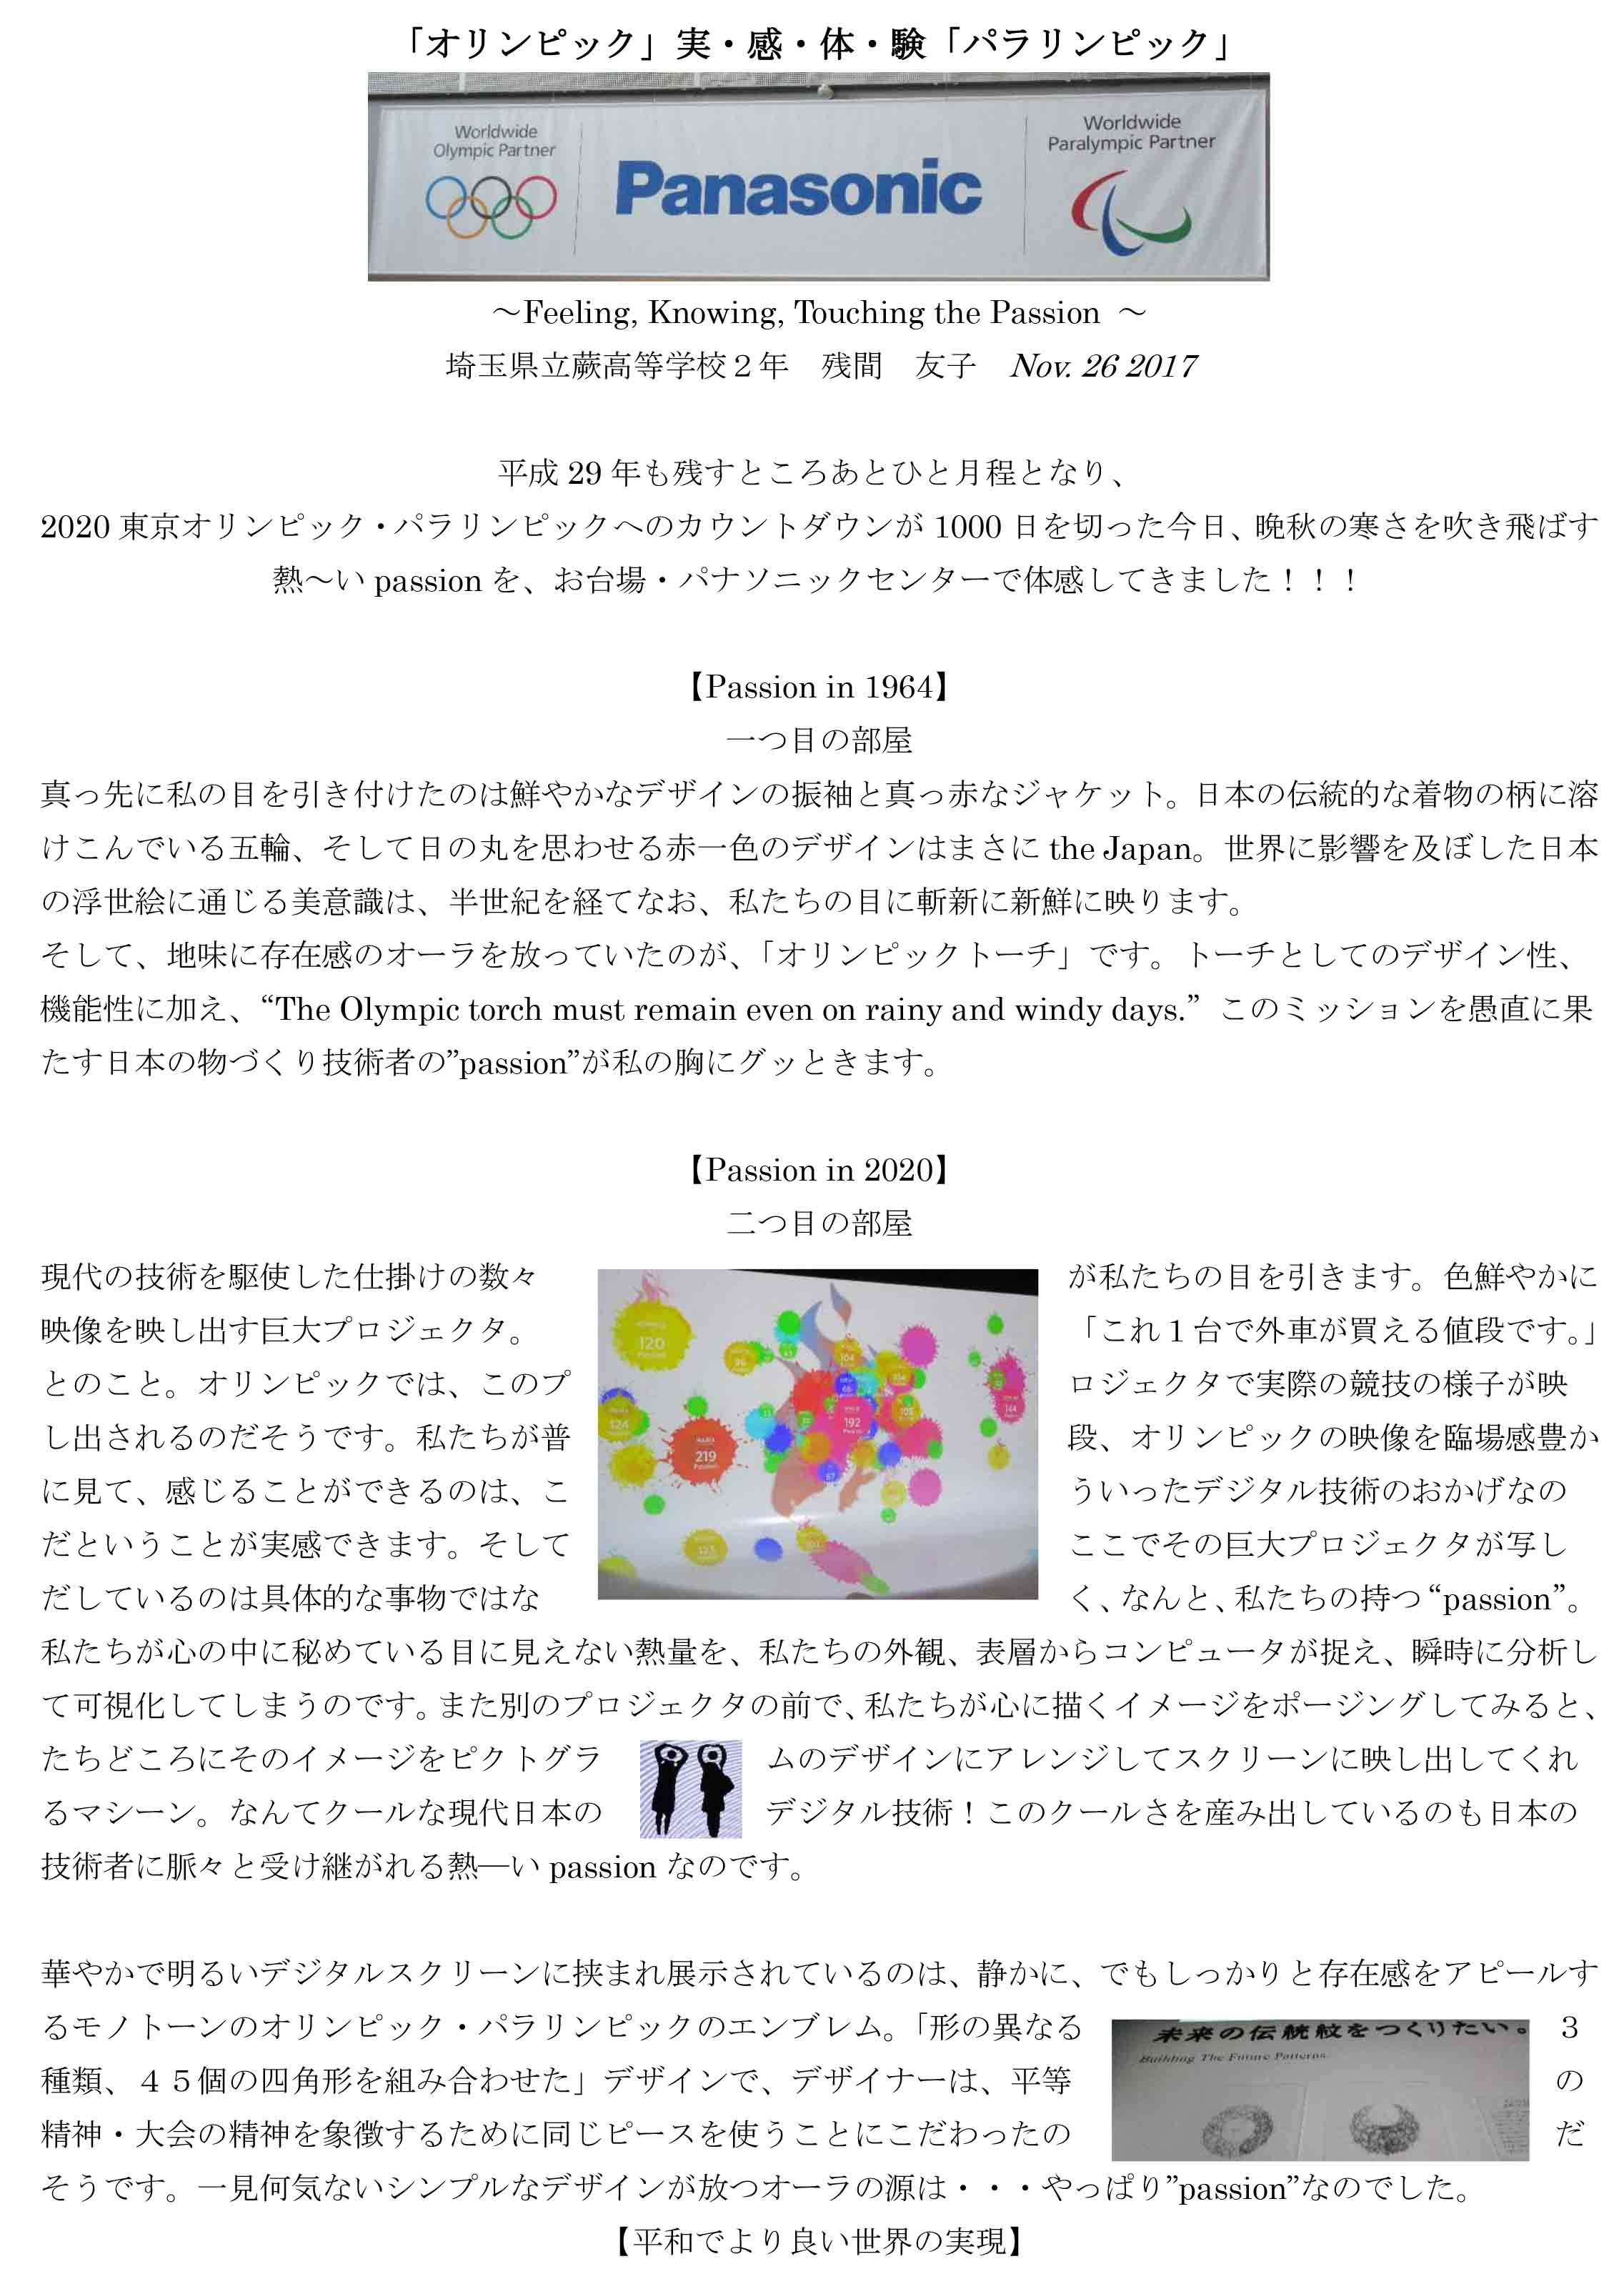 http://bunp.47news.jp/event/images/e_olyjikkanntaikenn_zanma1711_01.jpg